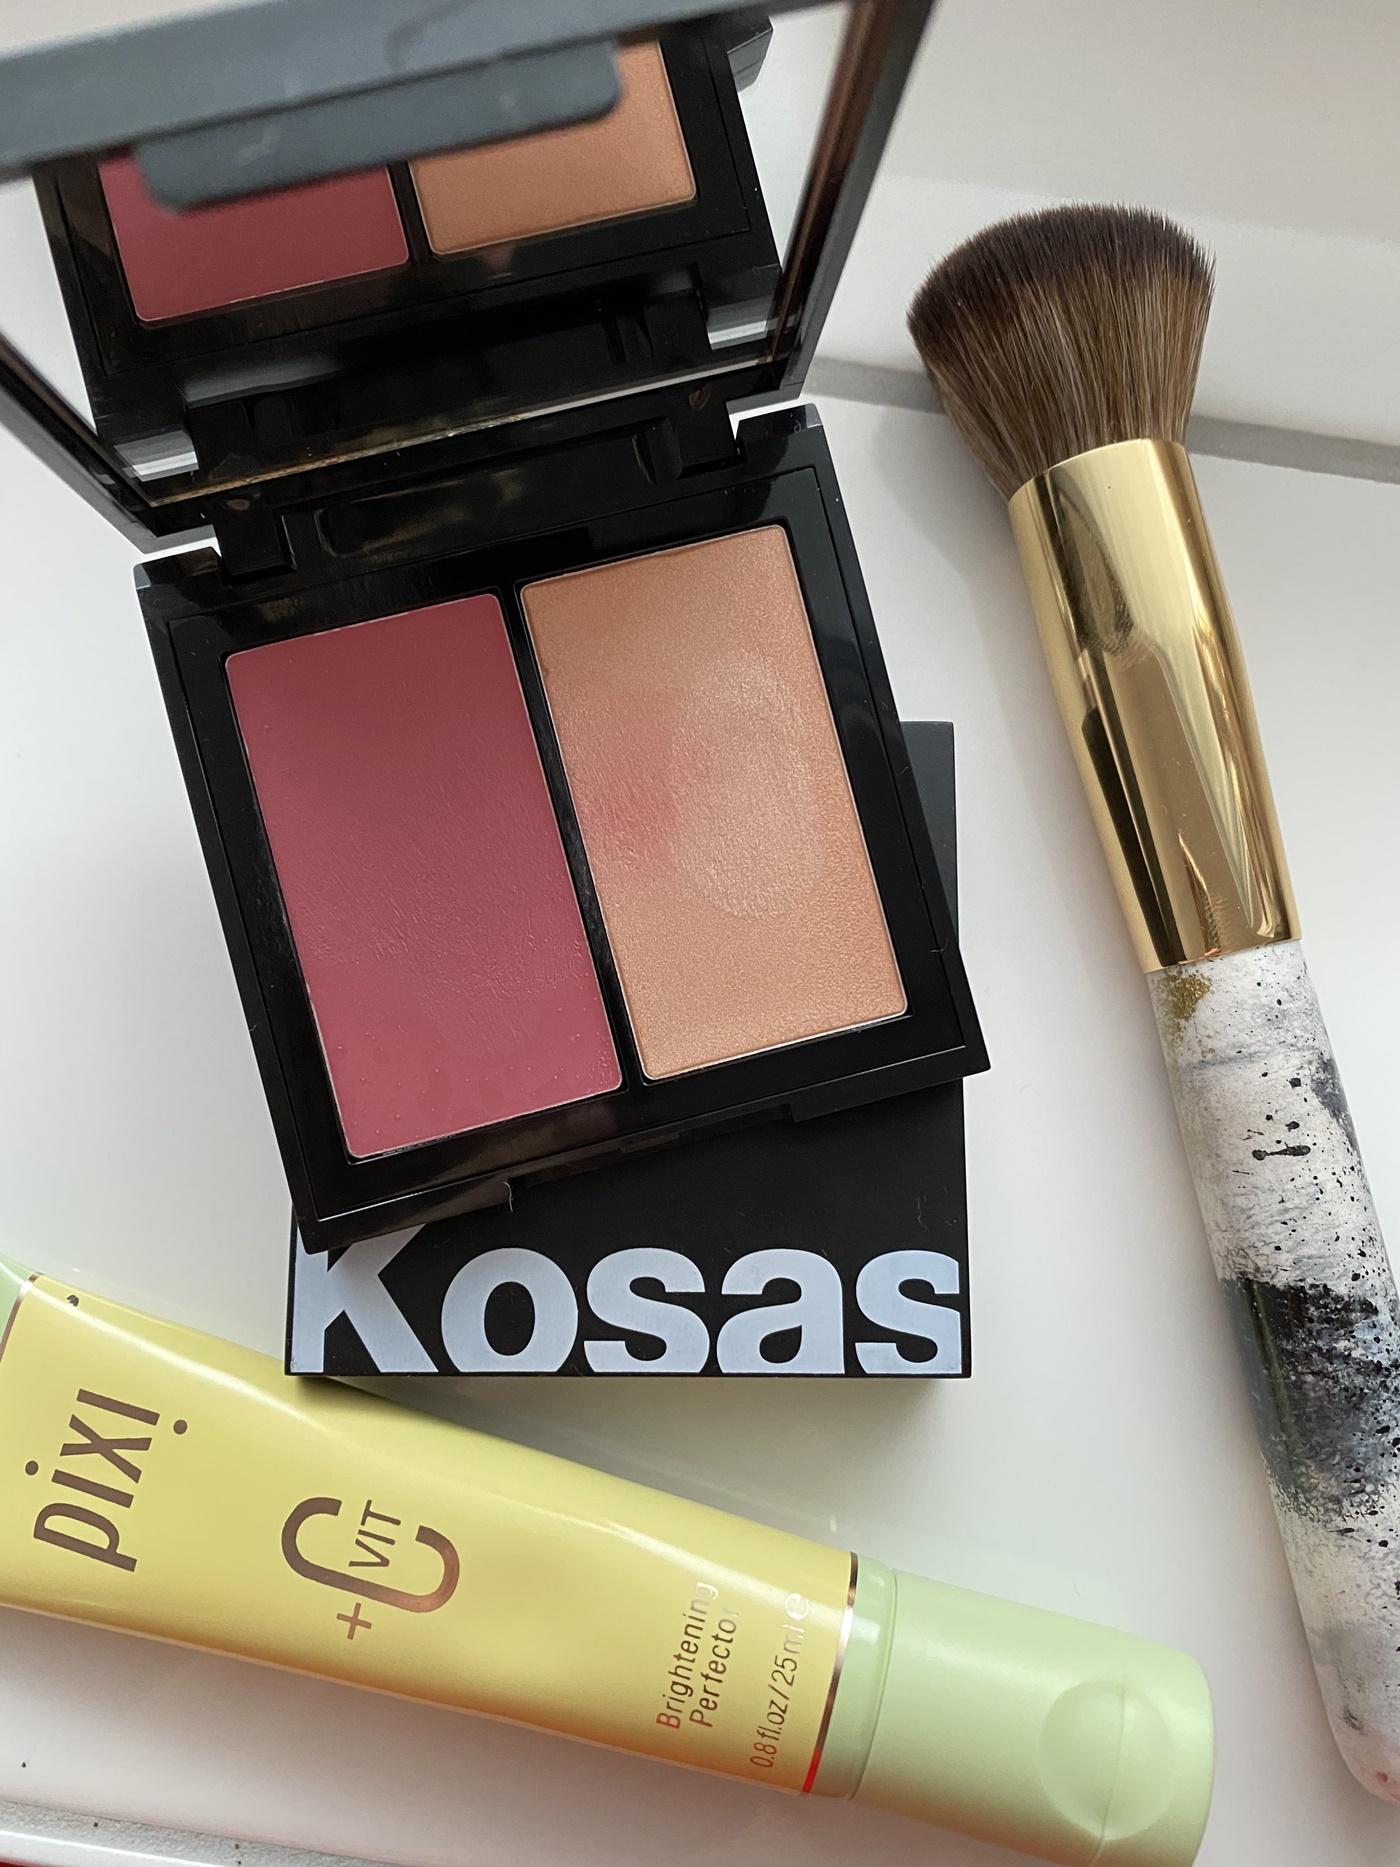 glamupyourlifestyle Koerpercreme O'keeffee's Skin Repair Apricot Pads Decollete Naturkosmetik Kosas